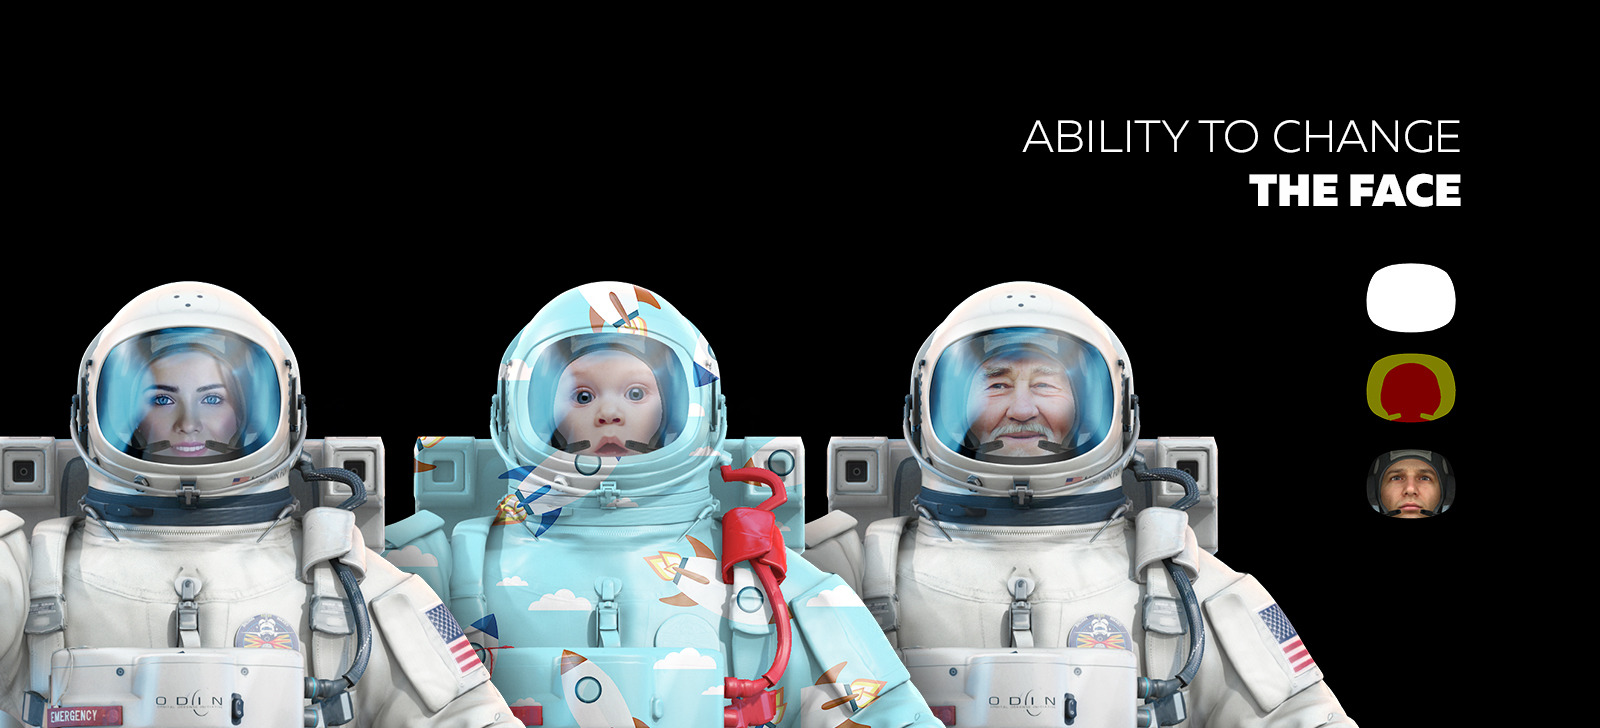 3D Mockup Space Astronaut #11